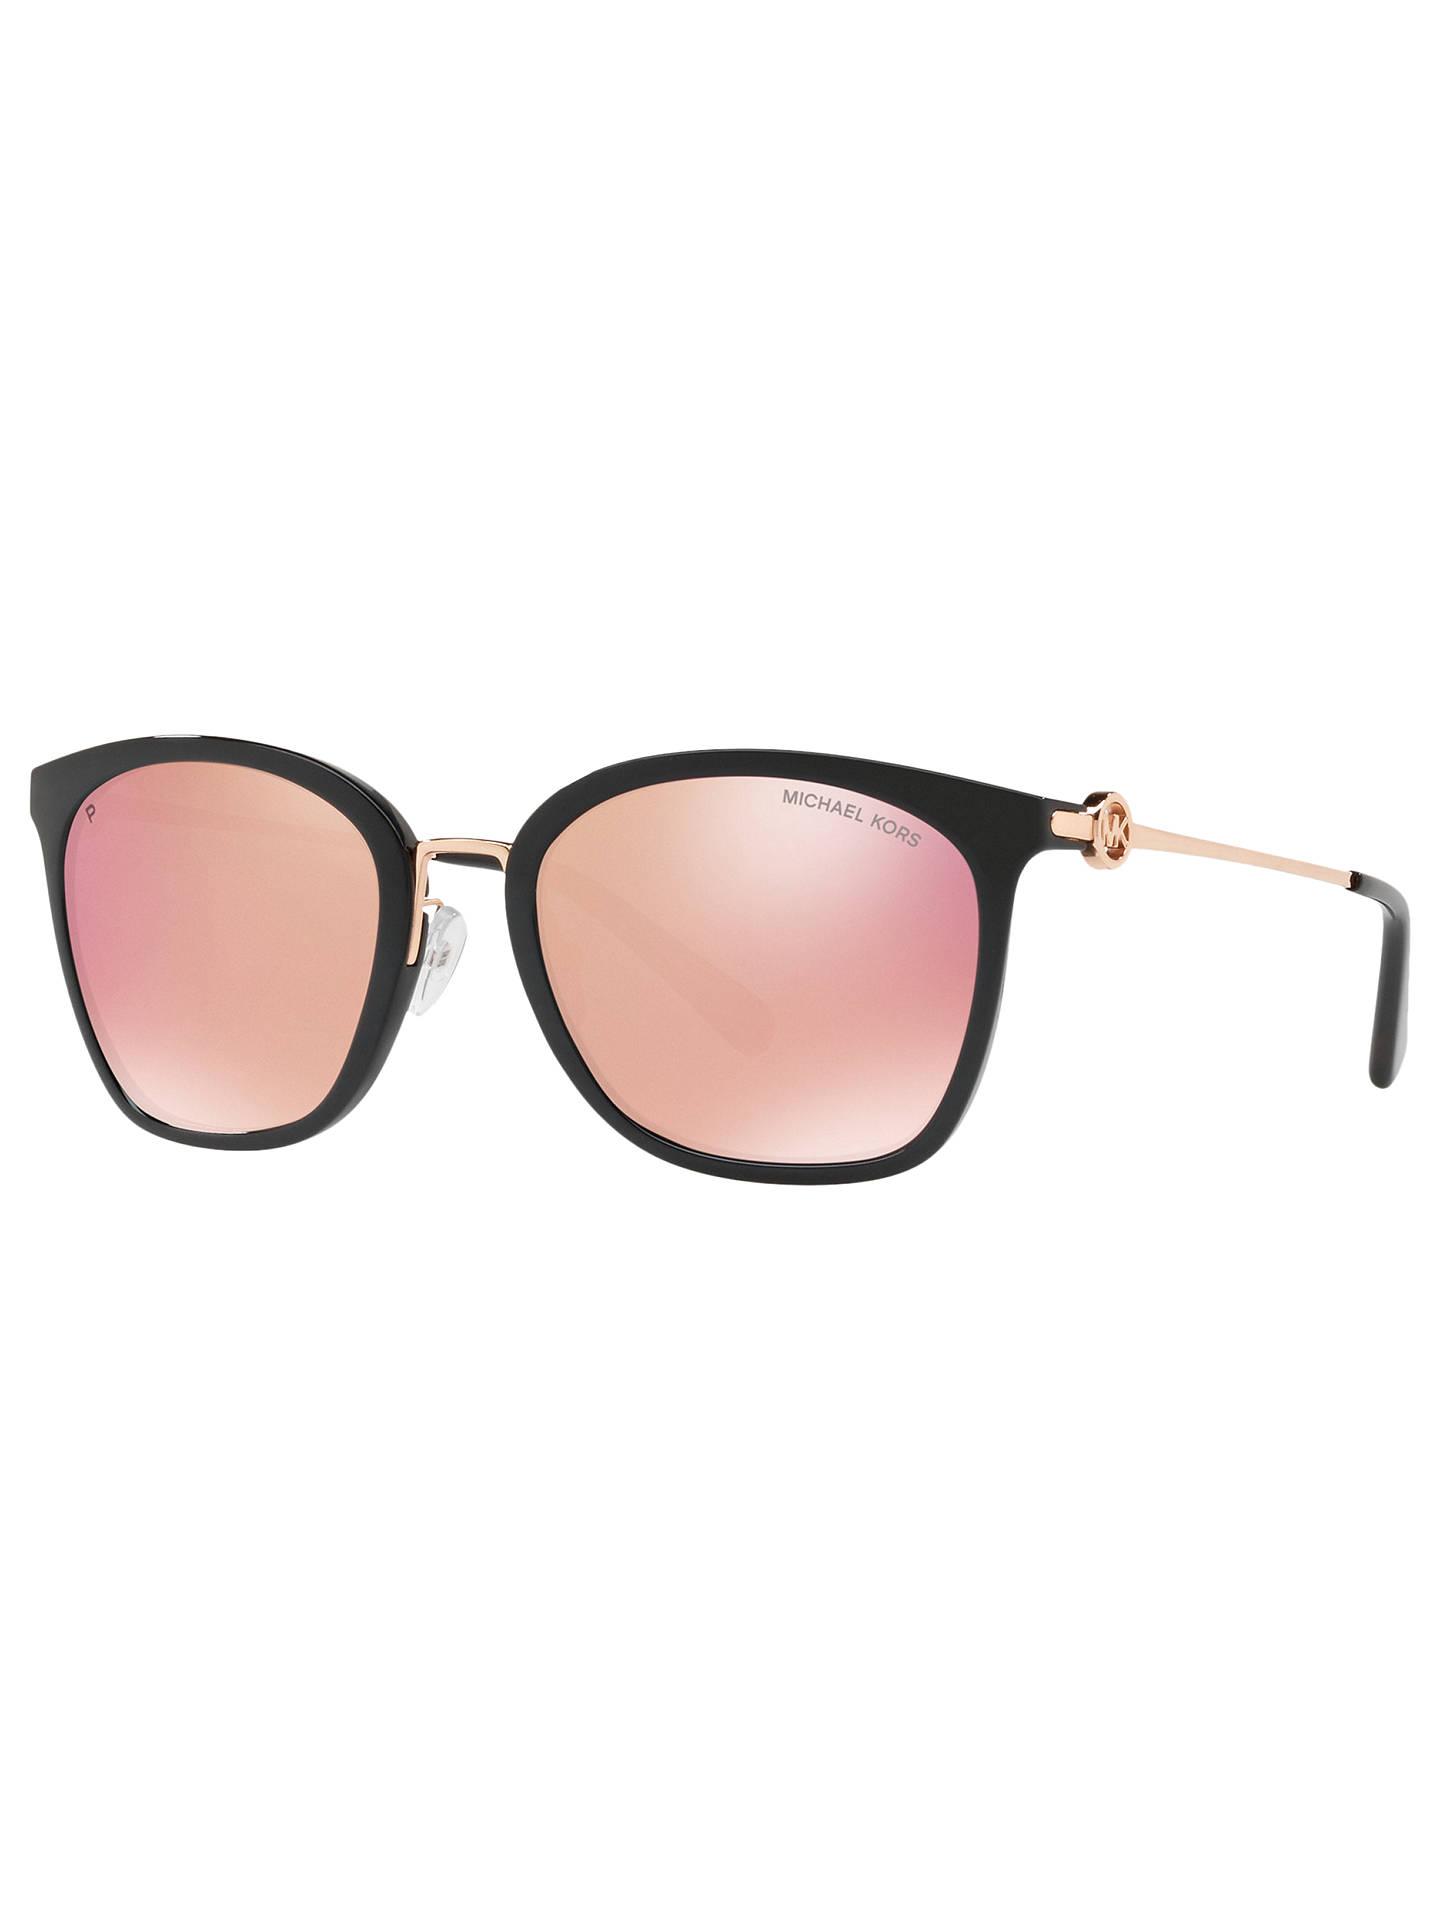 859cd23e2f6 Michael Kors MK2064 Women s Lugano Polarised Square Sunglasses ...